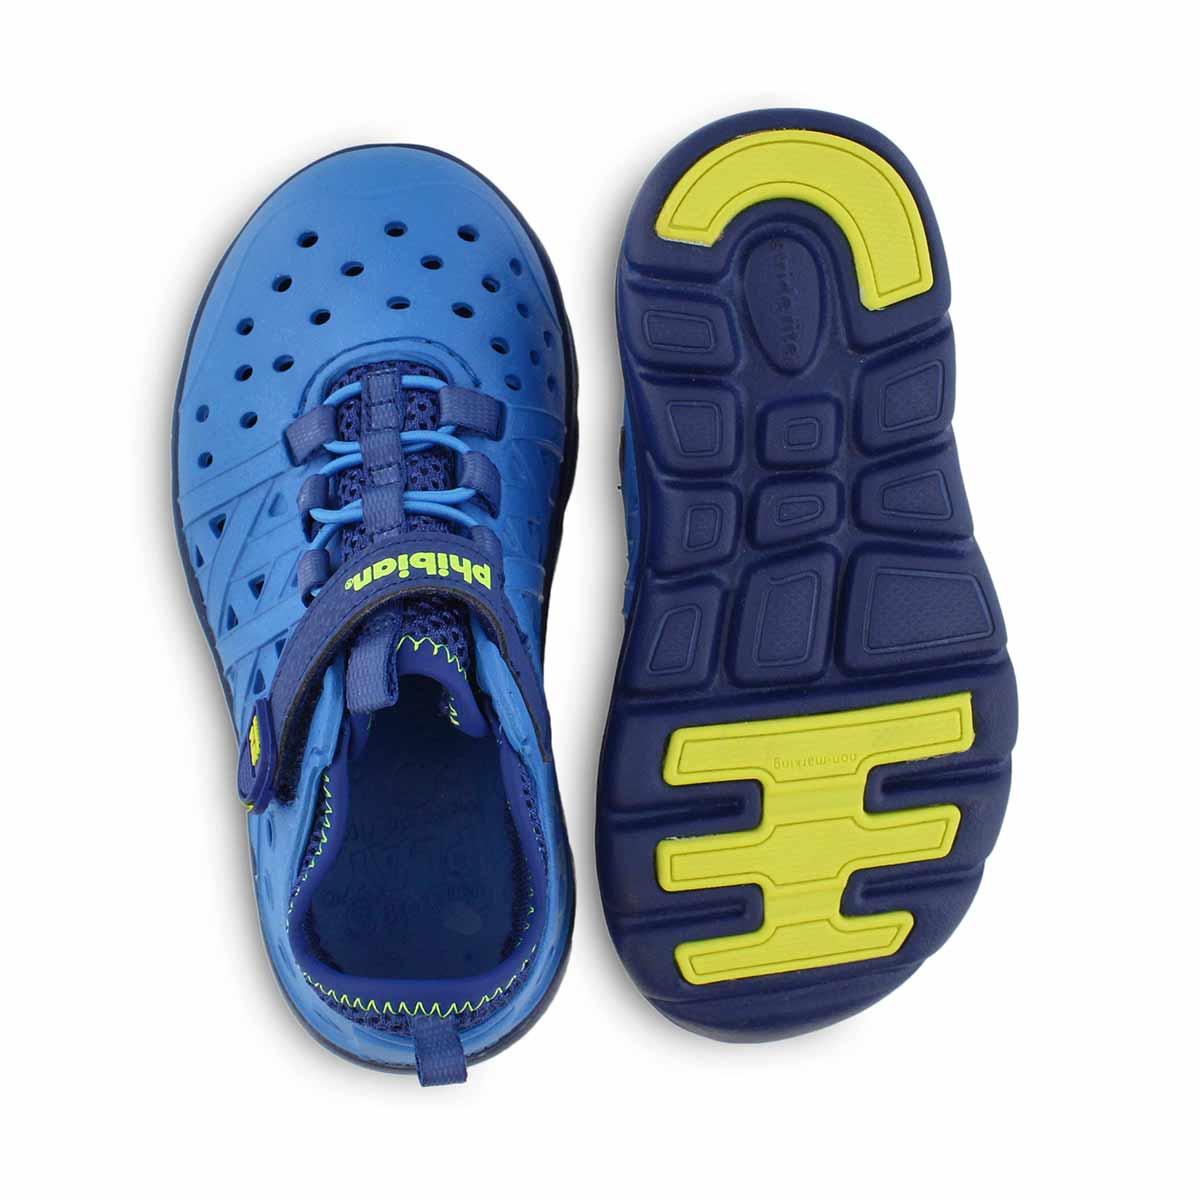 Bys M2P Phibian blue sneaker